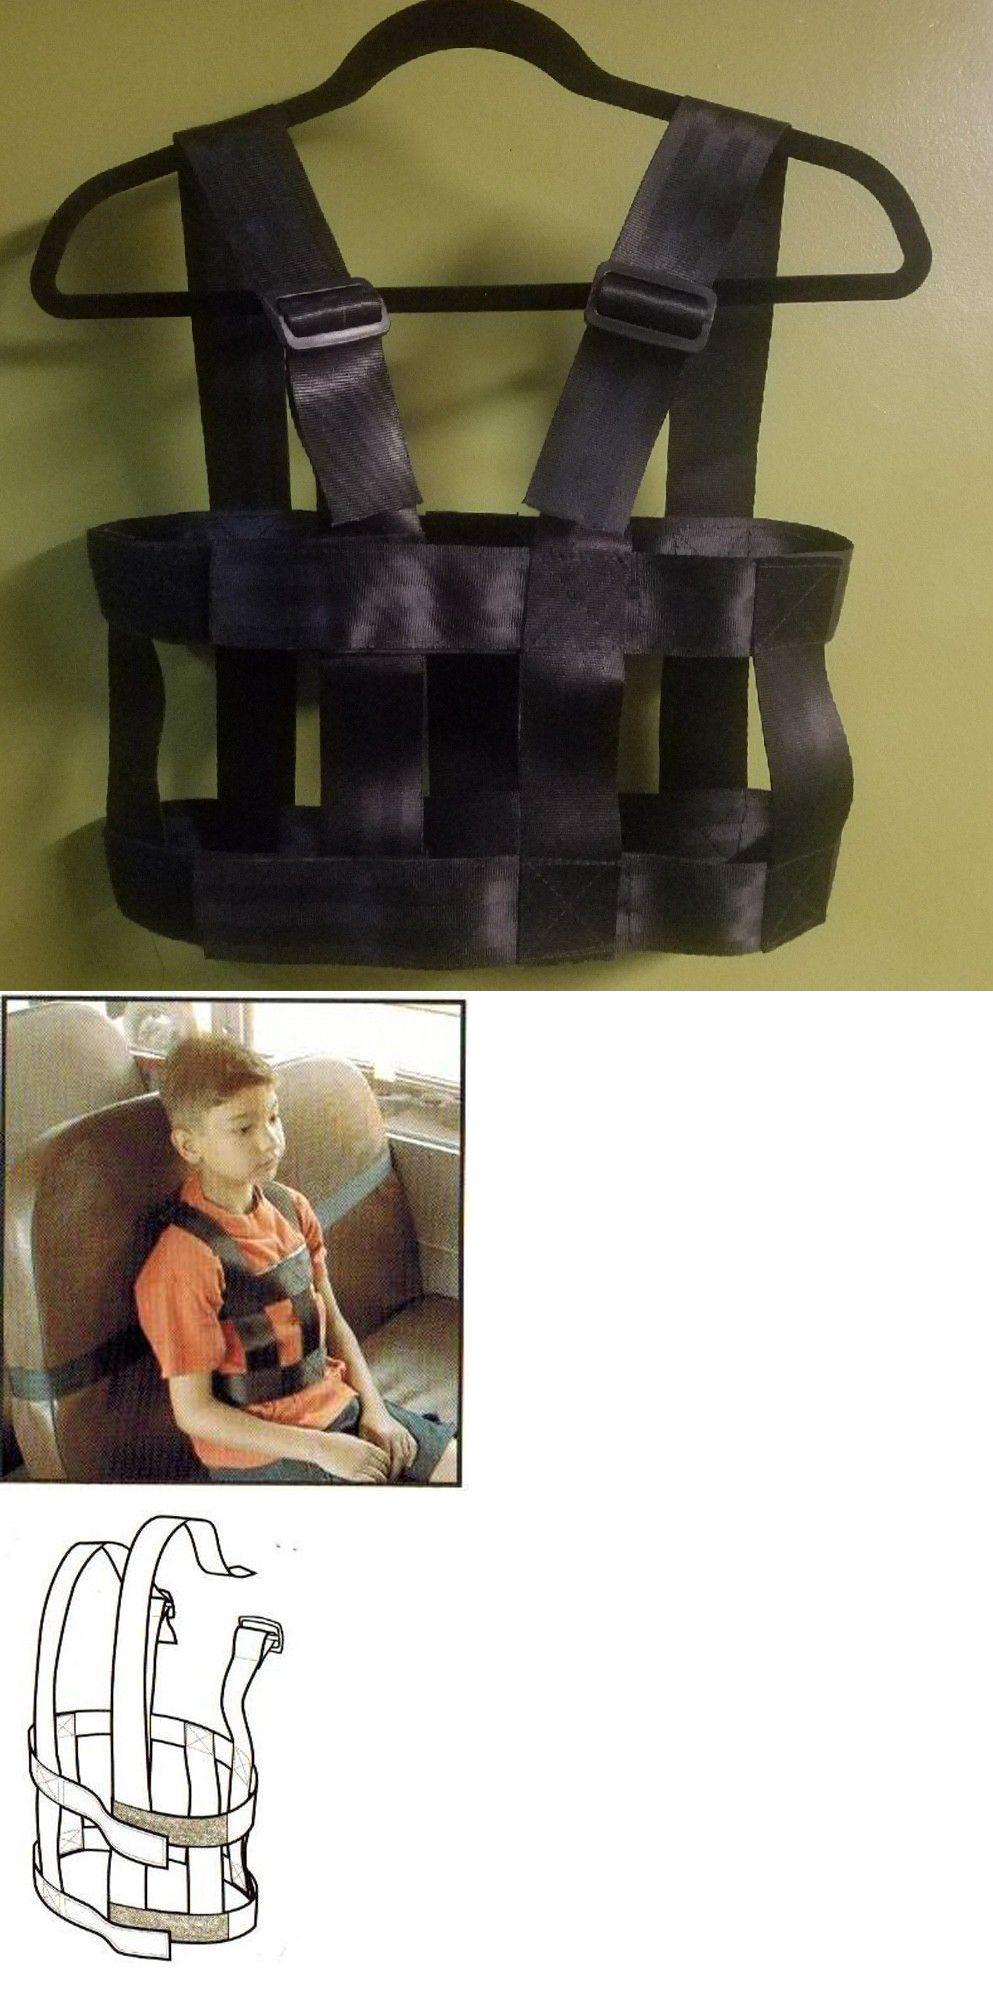 MEDIUM SIT RITE Safety Vest Restraint  Special Needs Seatbelt Harness School Bus